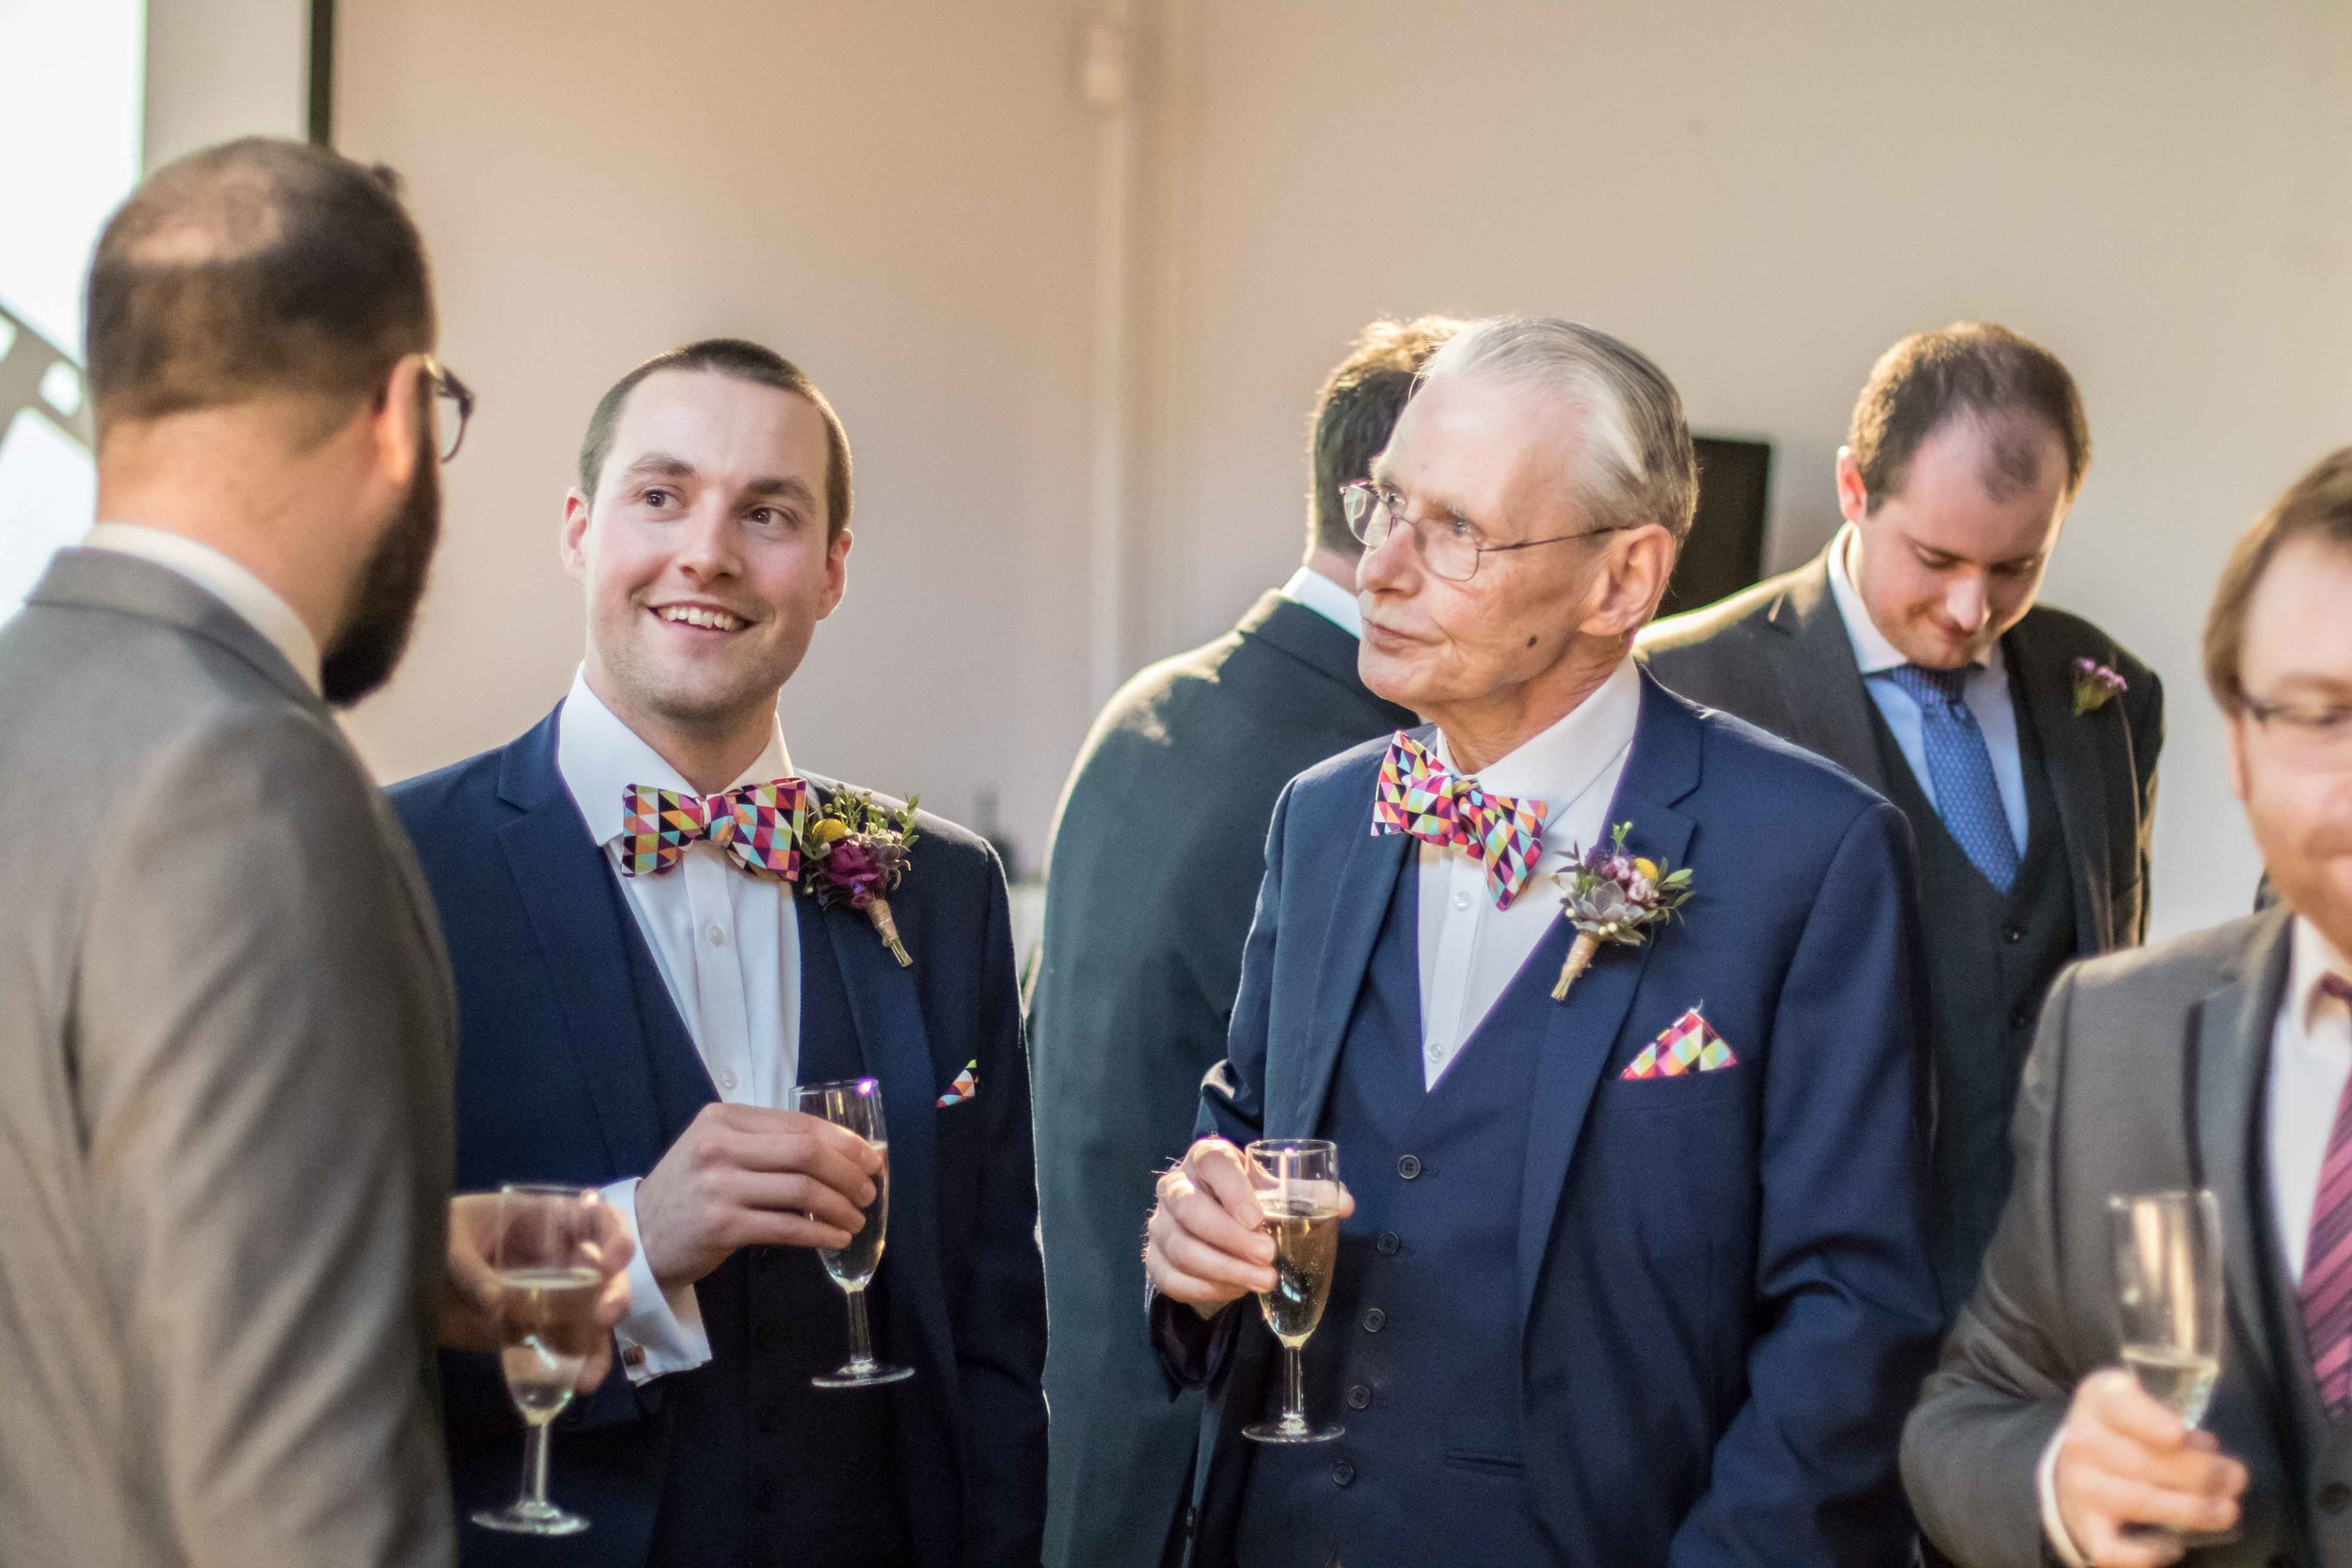 Adam & Faye - Wright Wedding Photography - Bristol Wedding Photographer -172.jpg